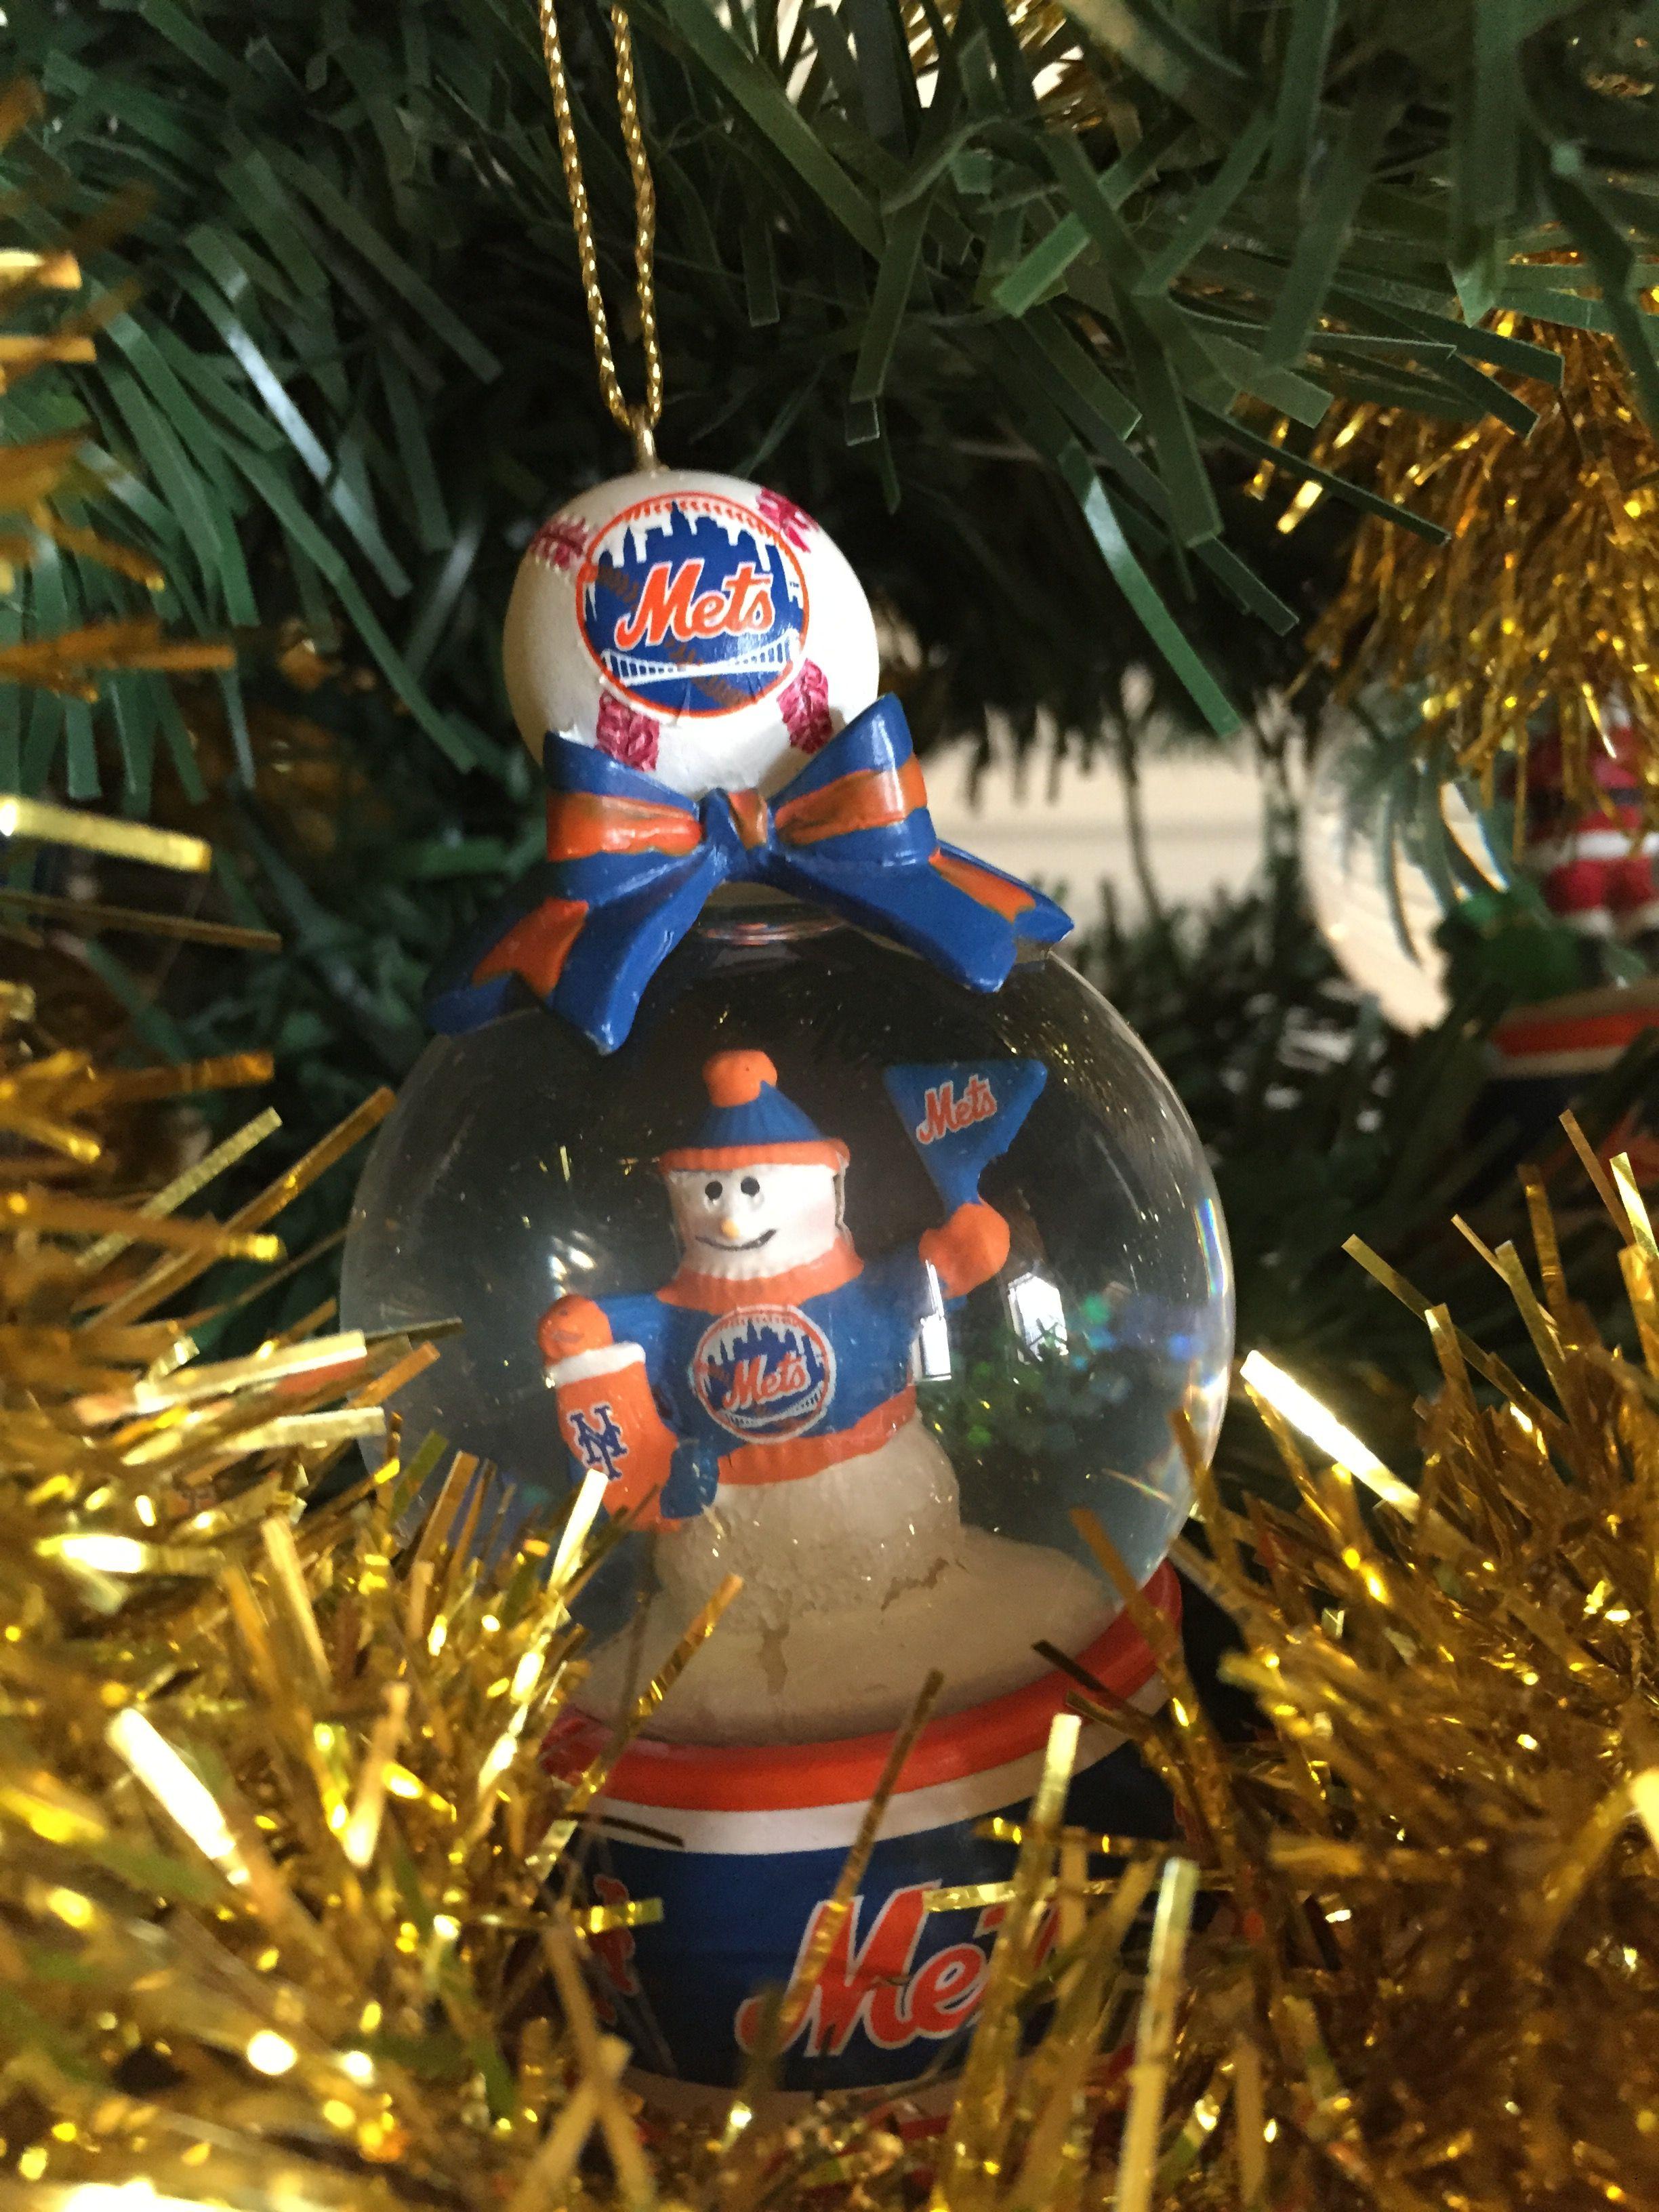 Pin by Dorothy Prinzivalli-Edelstein on NY Mets | Pinterest